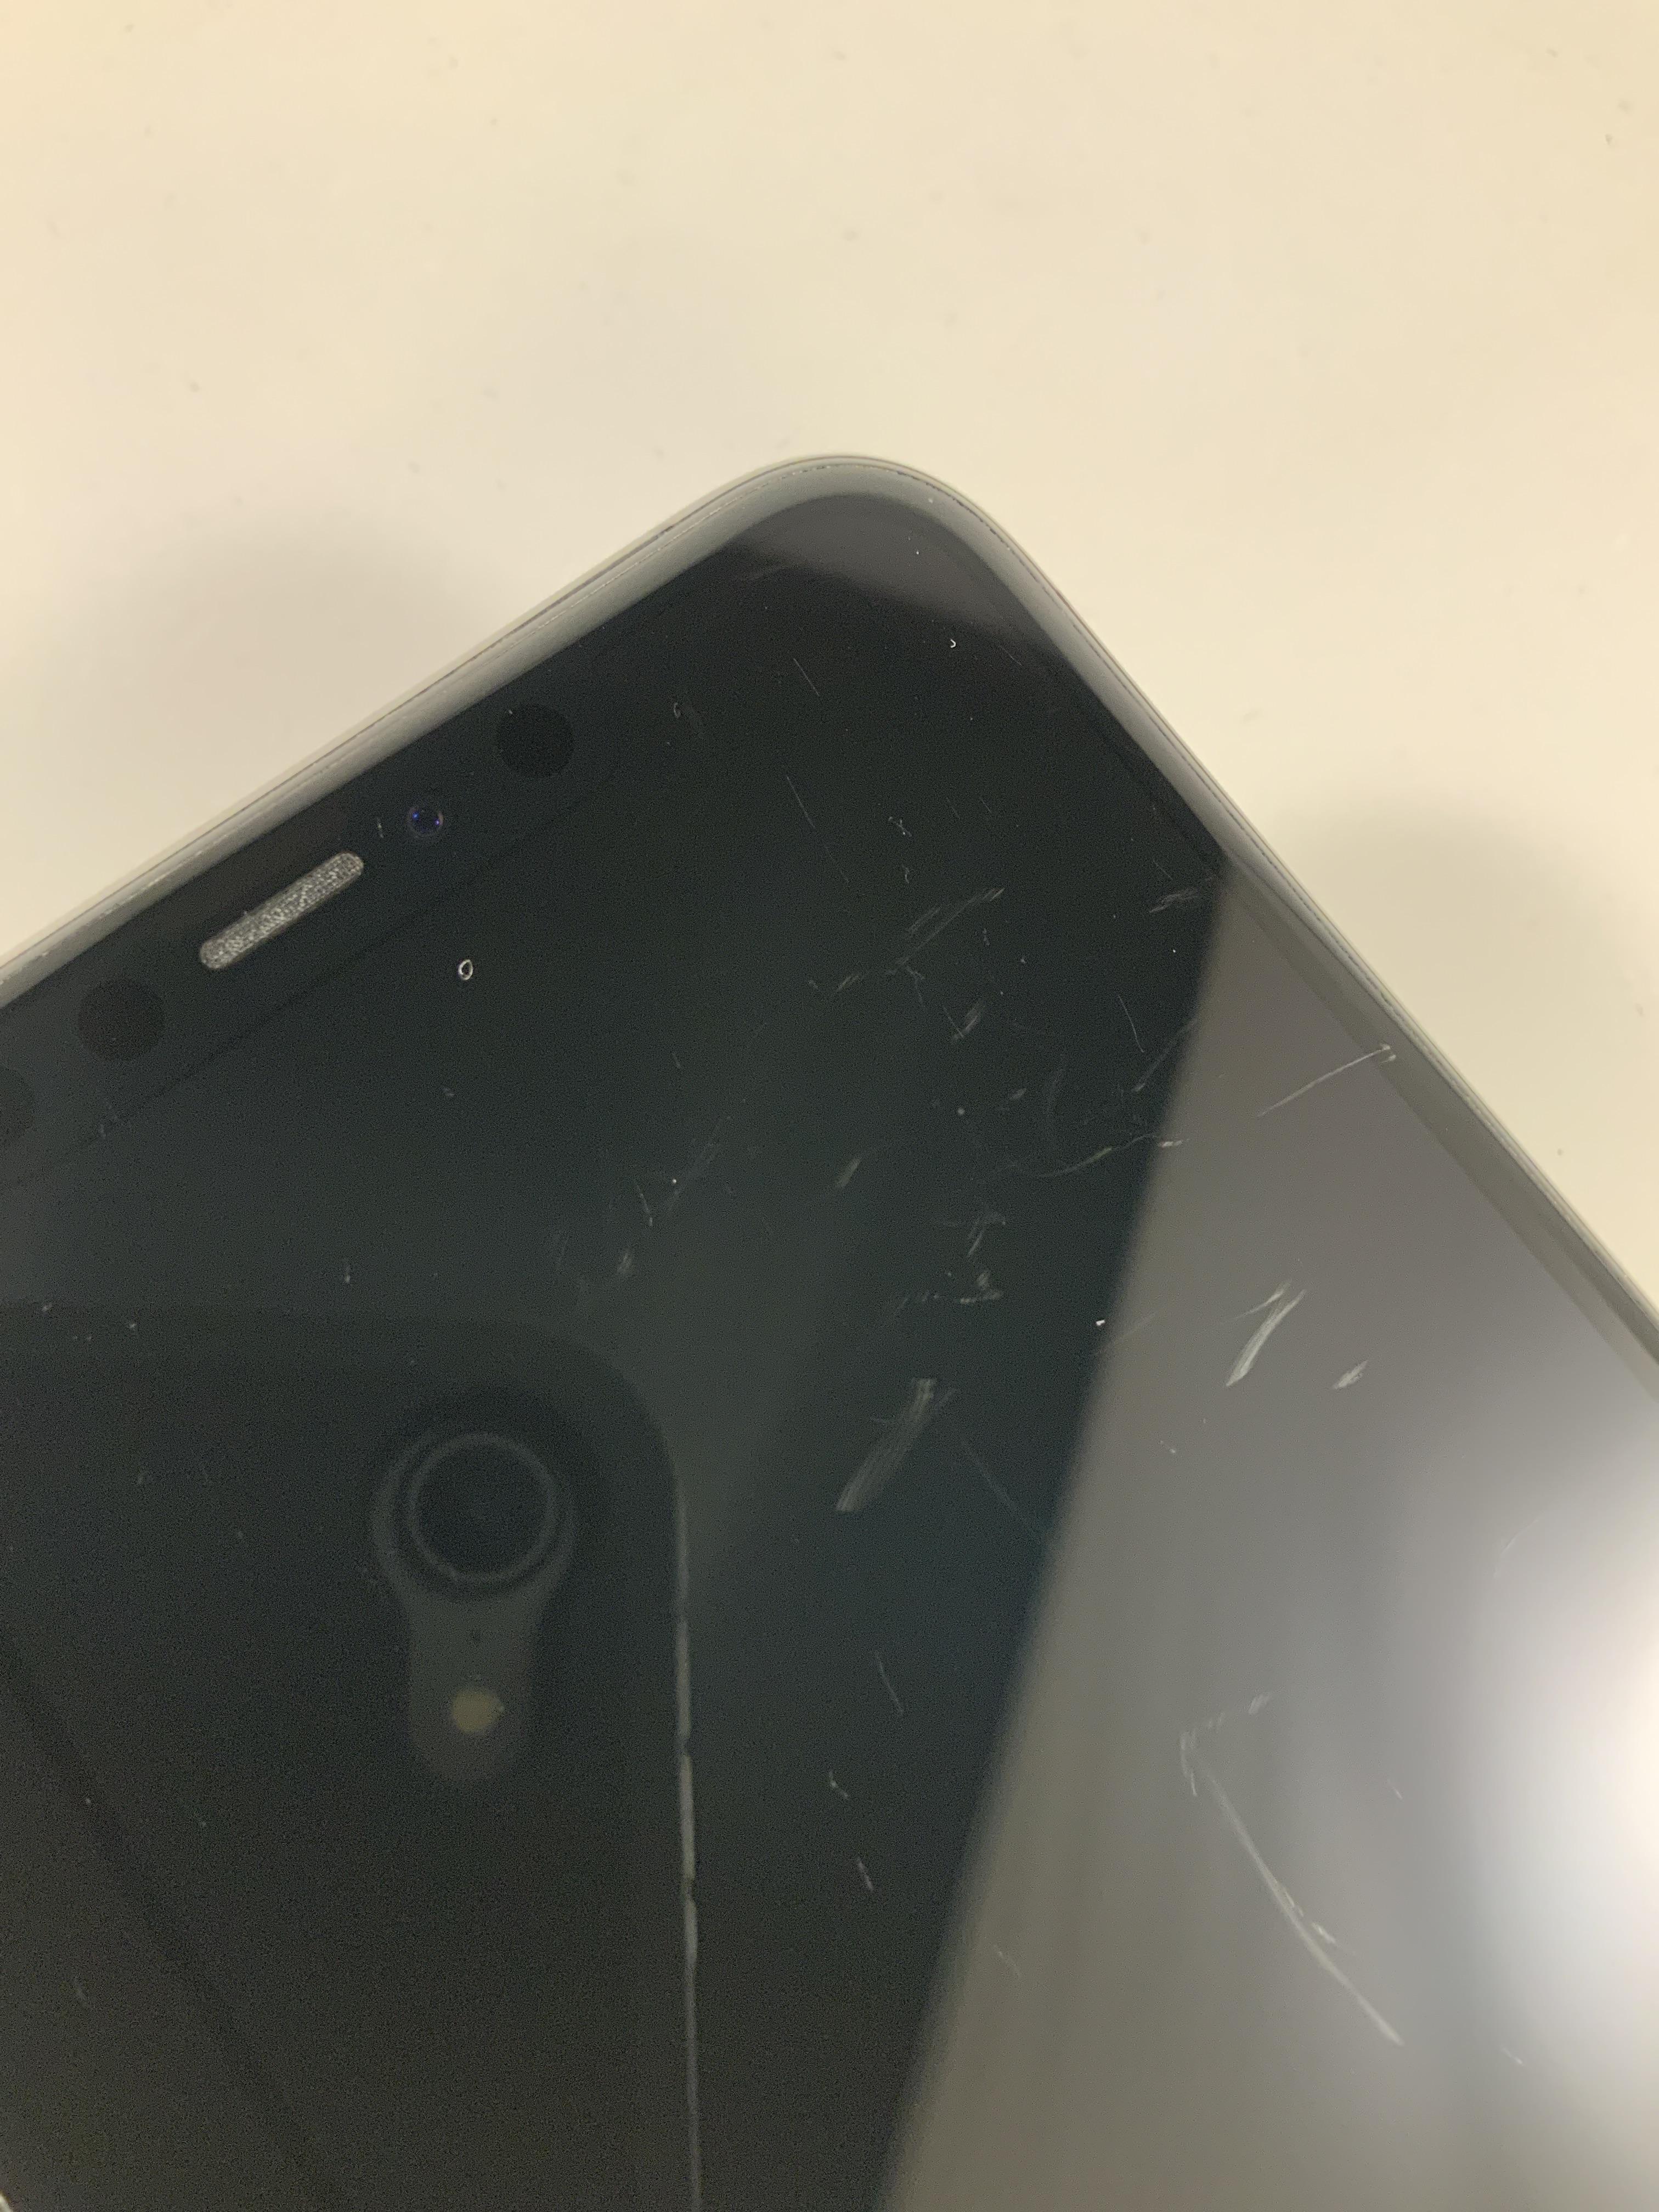 iPhone 11 Pro Max 256GB, 256GB, Space Gray, Kuva 3